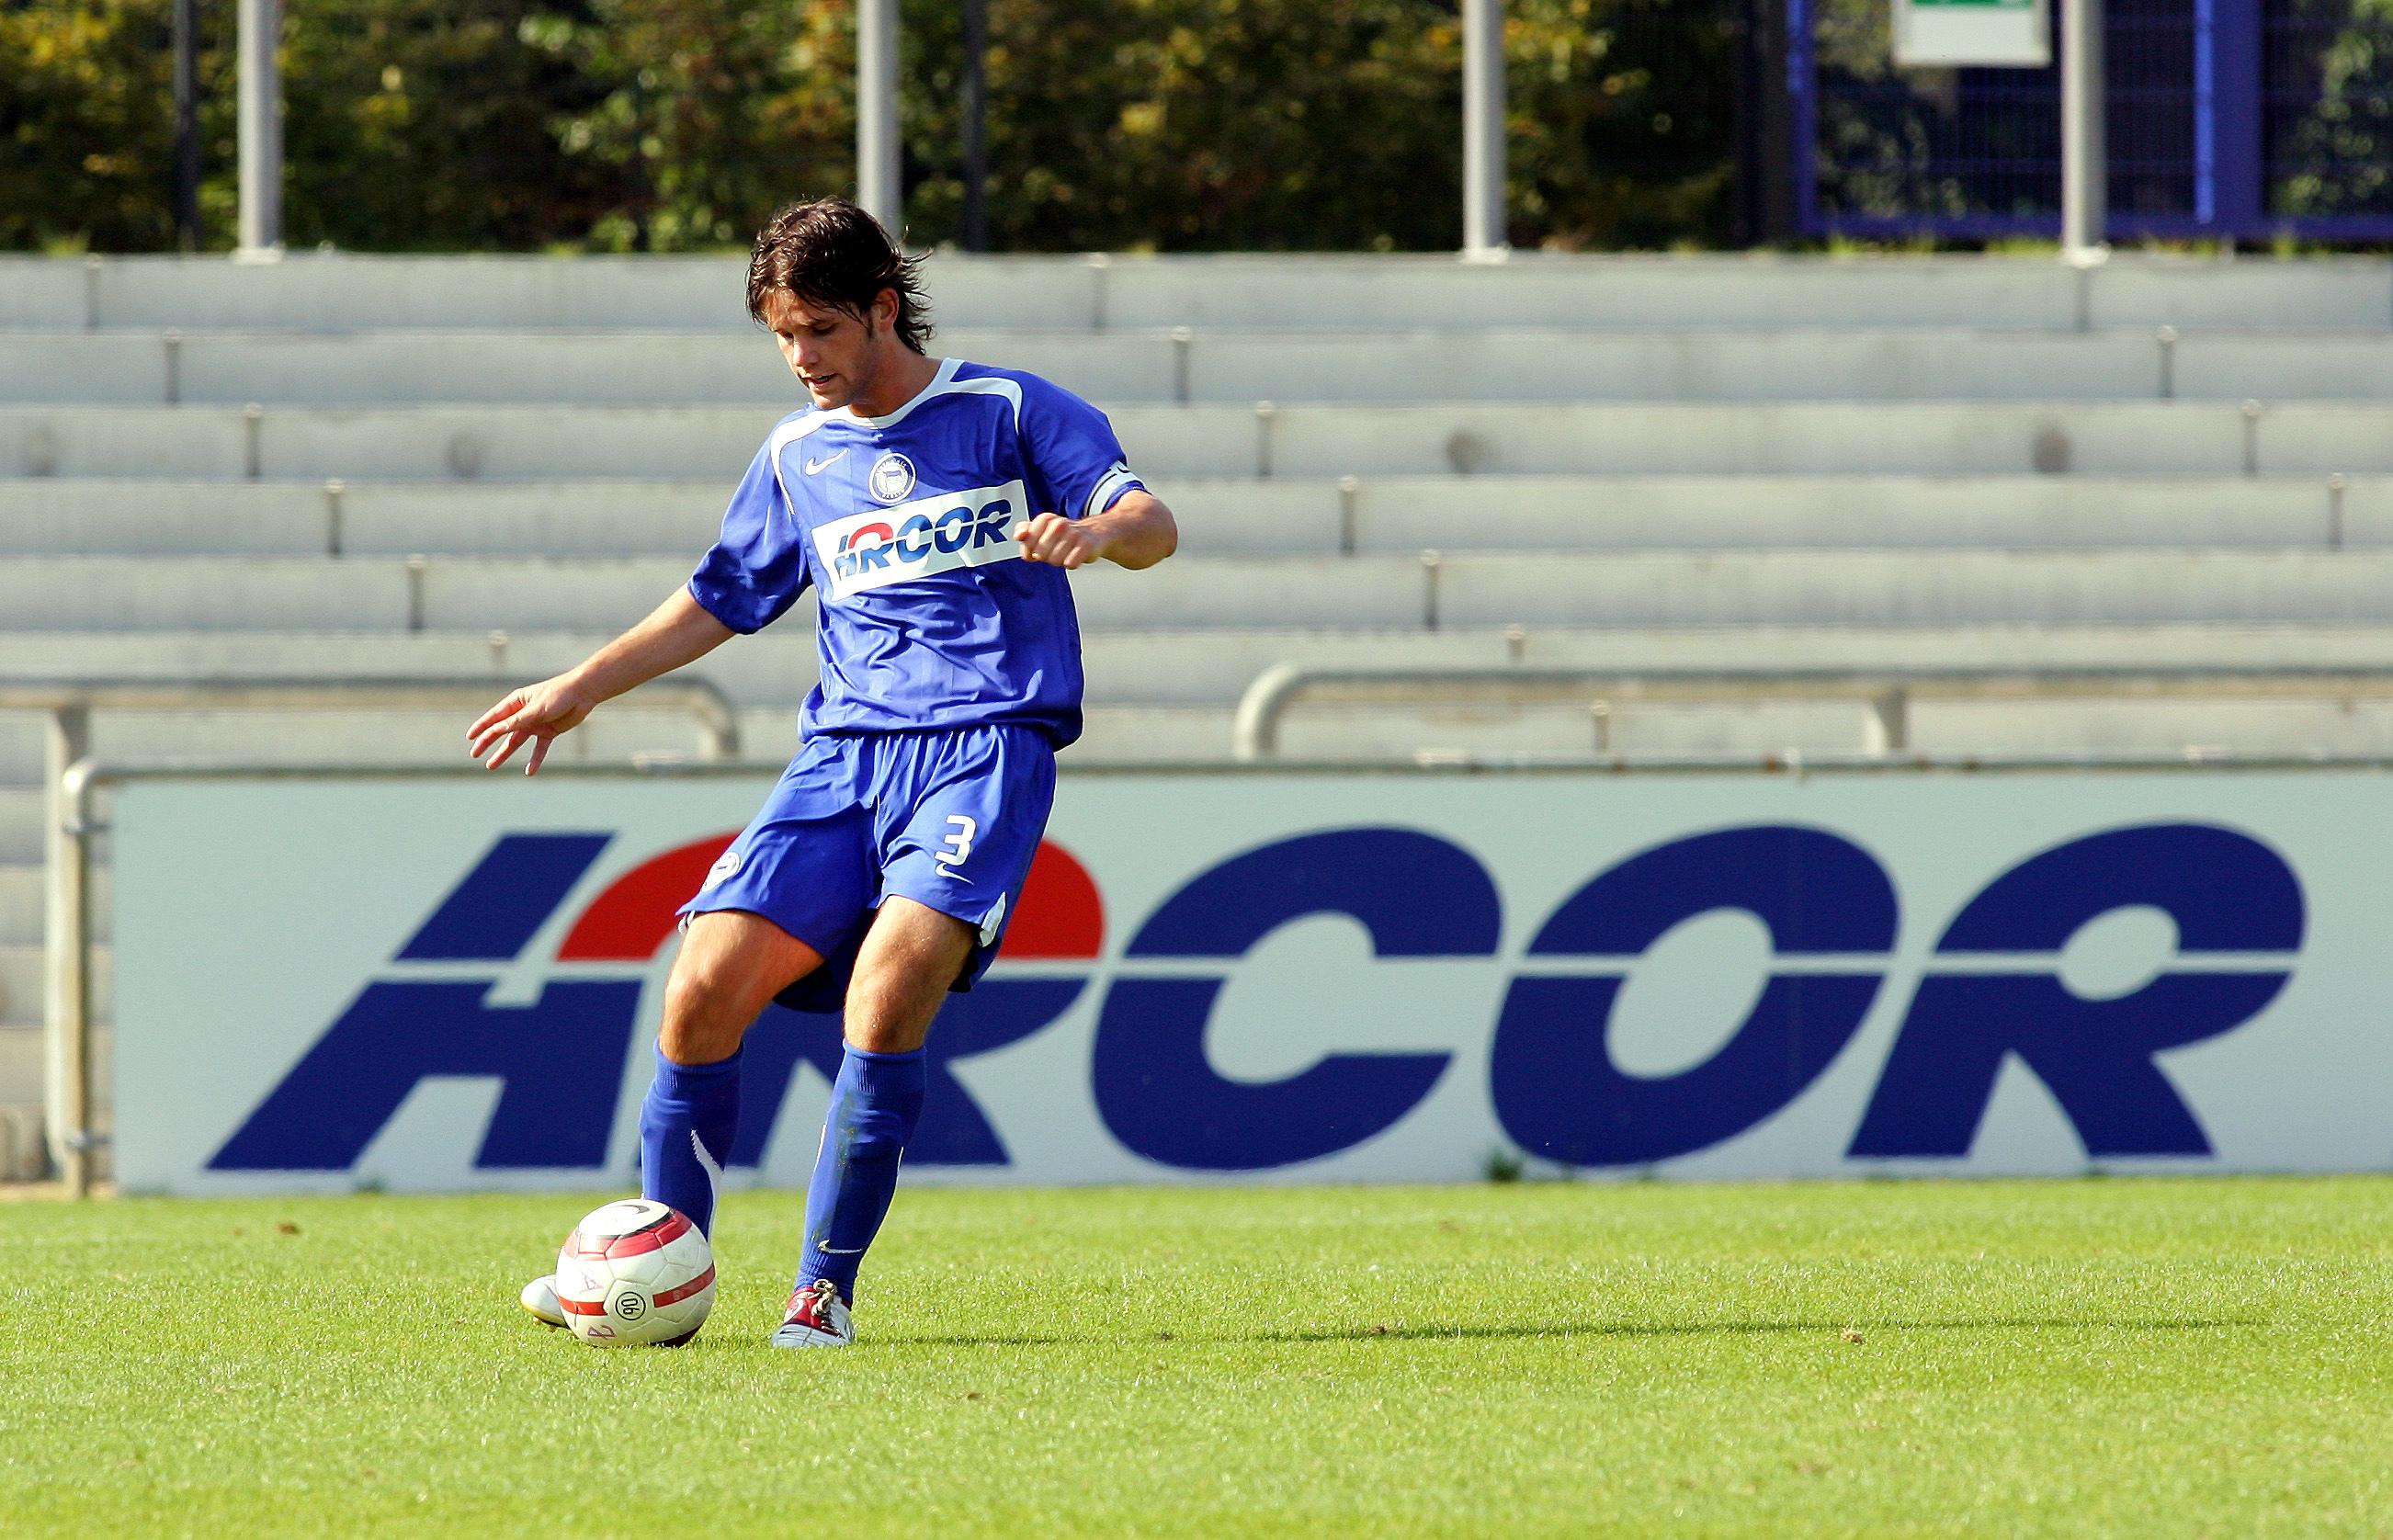 Rico Morack